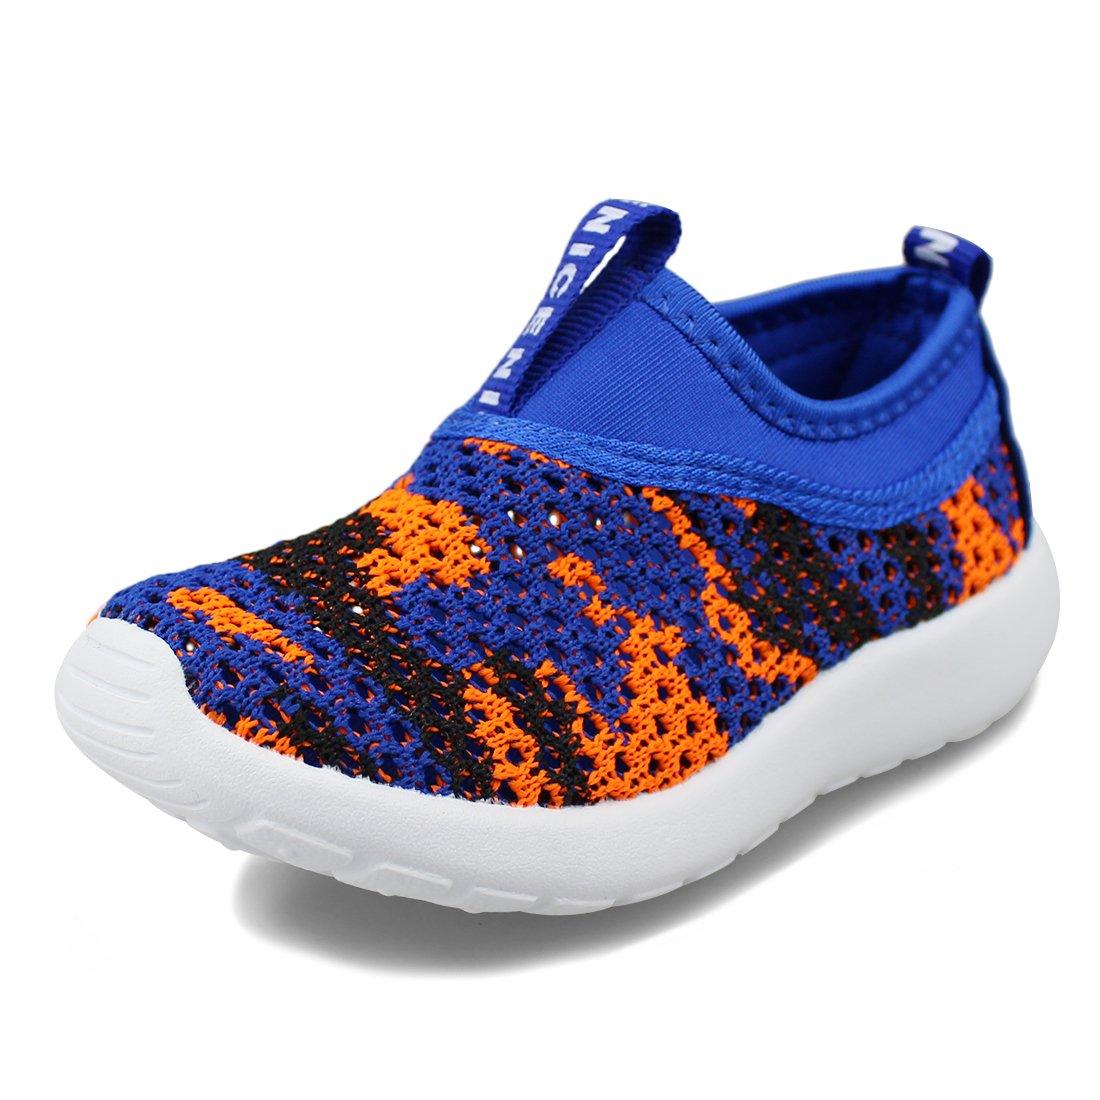 Hawkwell Kids Breathable Slip-on Sneaker(Toddler/Little Kid),Blue Fabric,11 M US